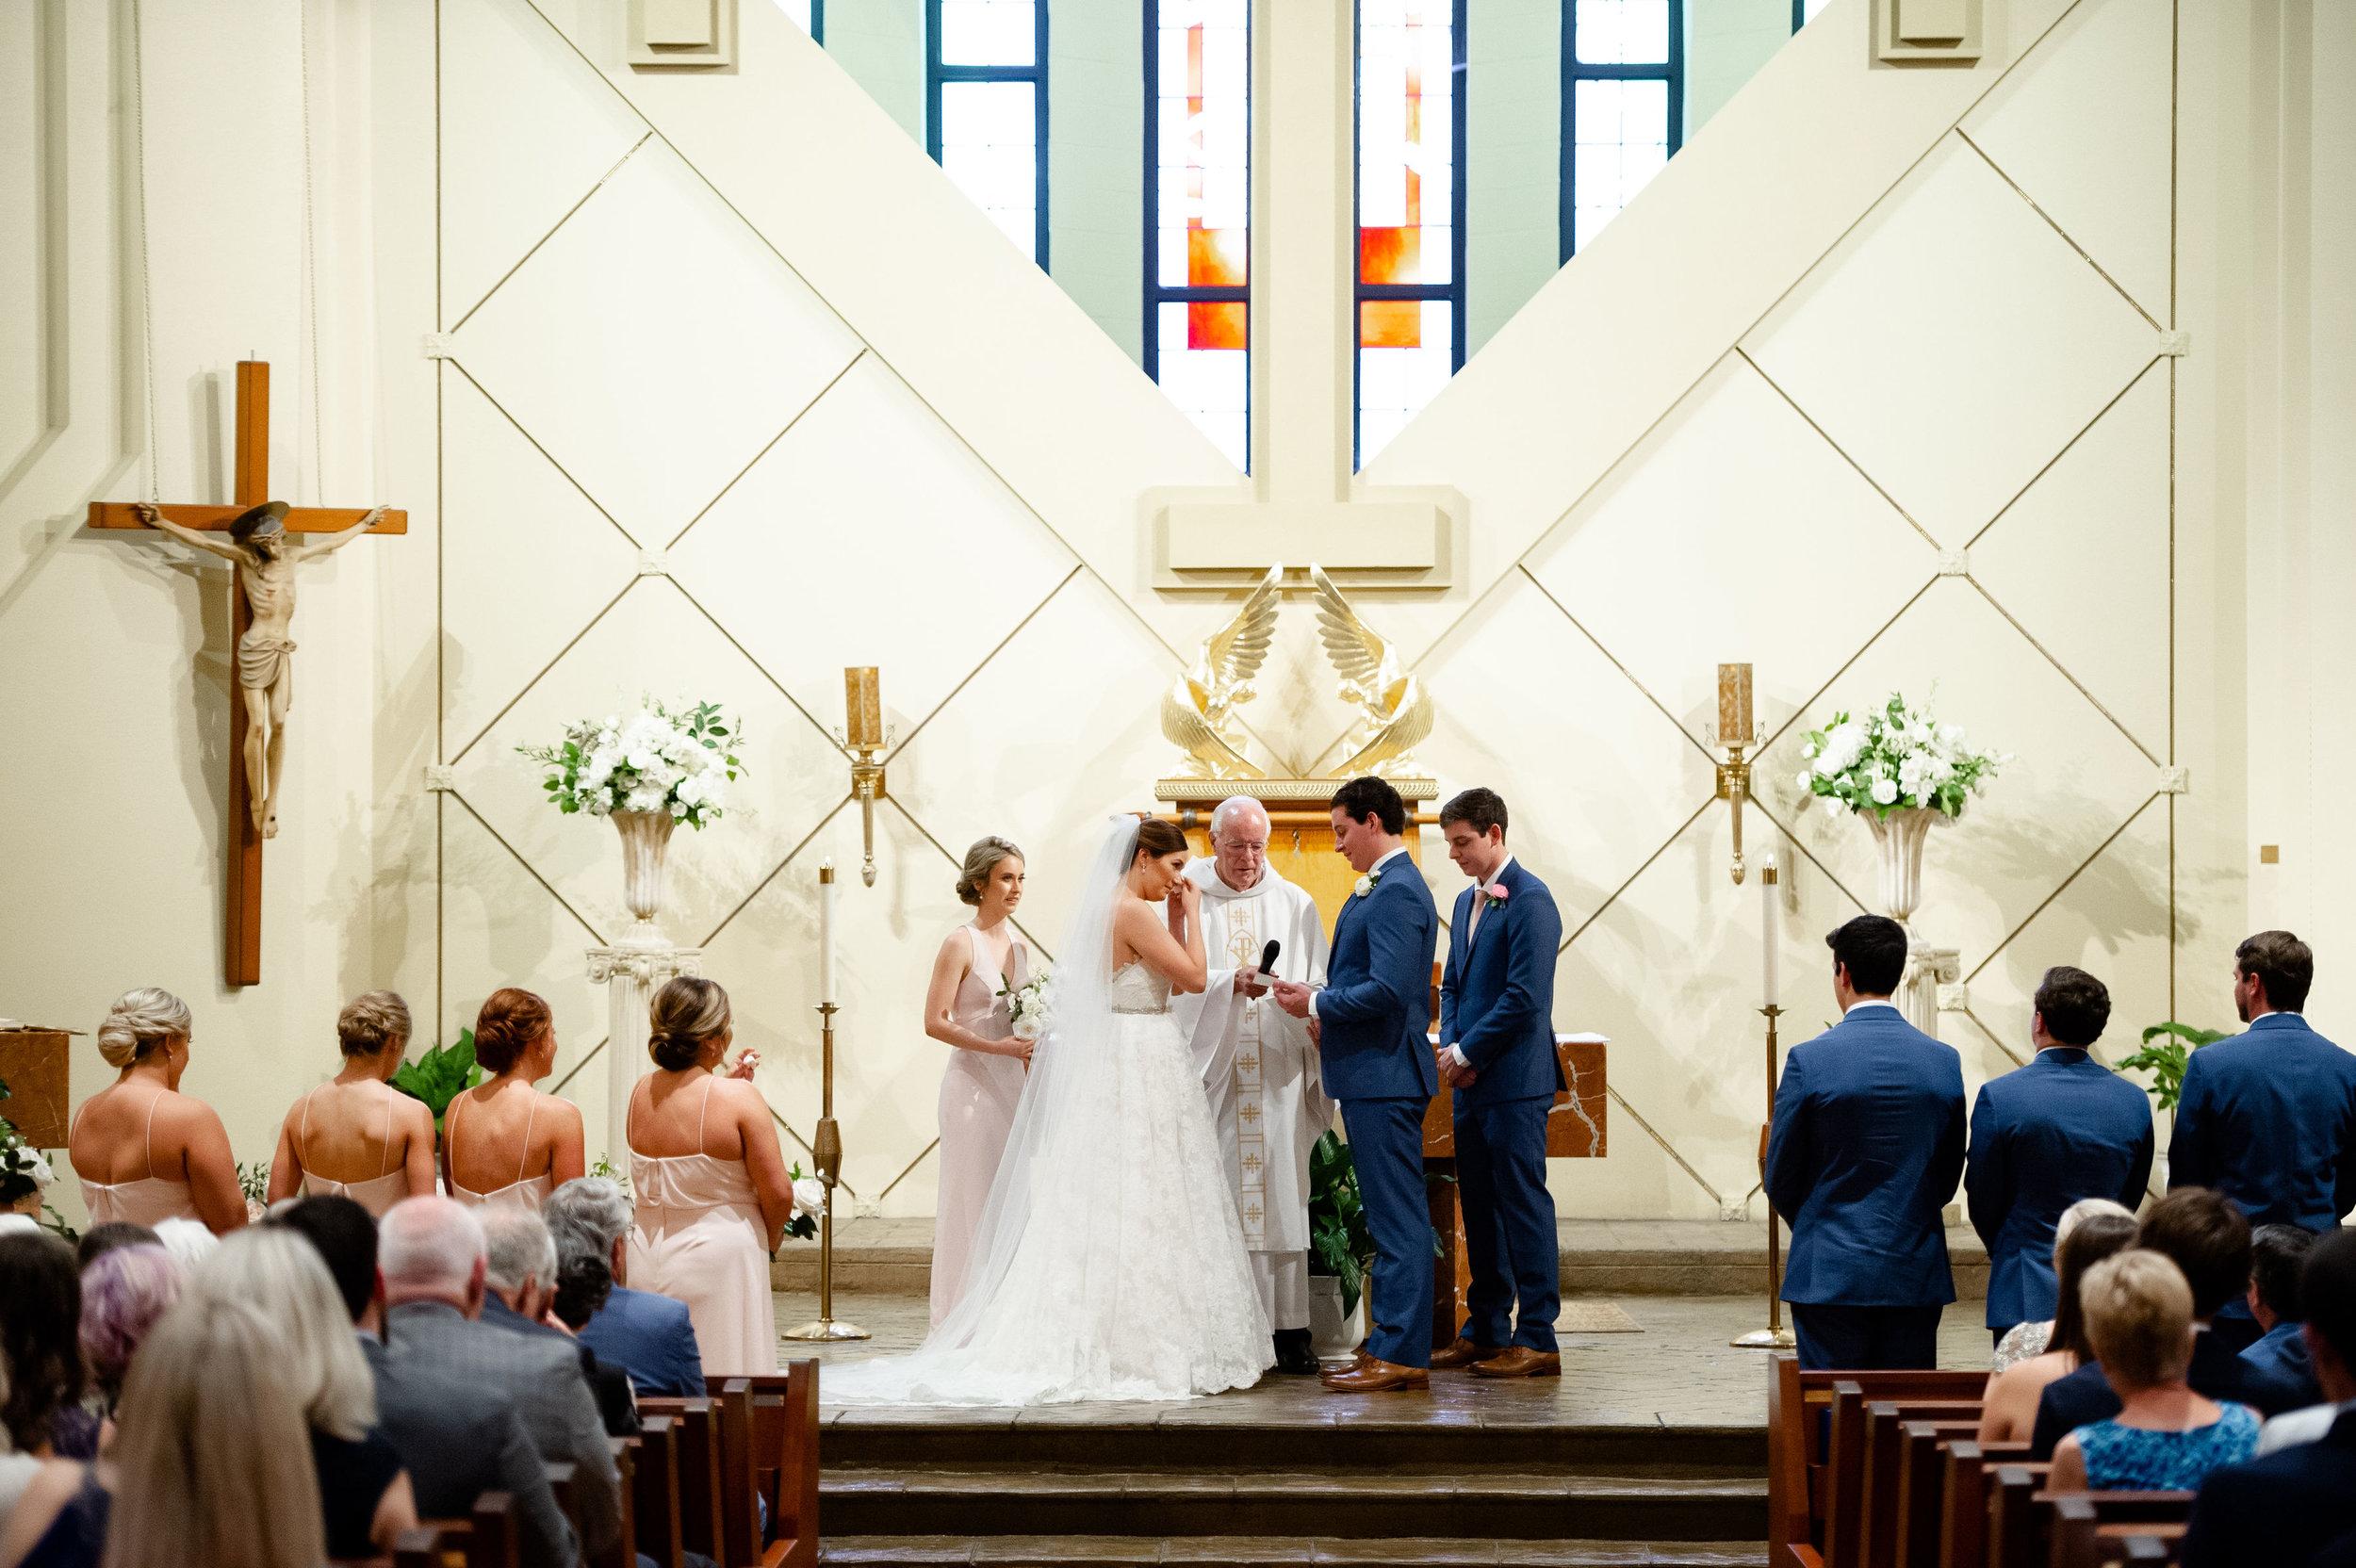 McElravey_Wedding_CarolineLimaPhotography_2018_120.jpg